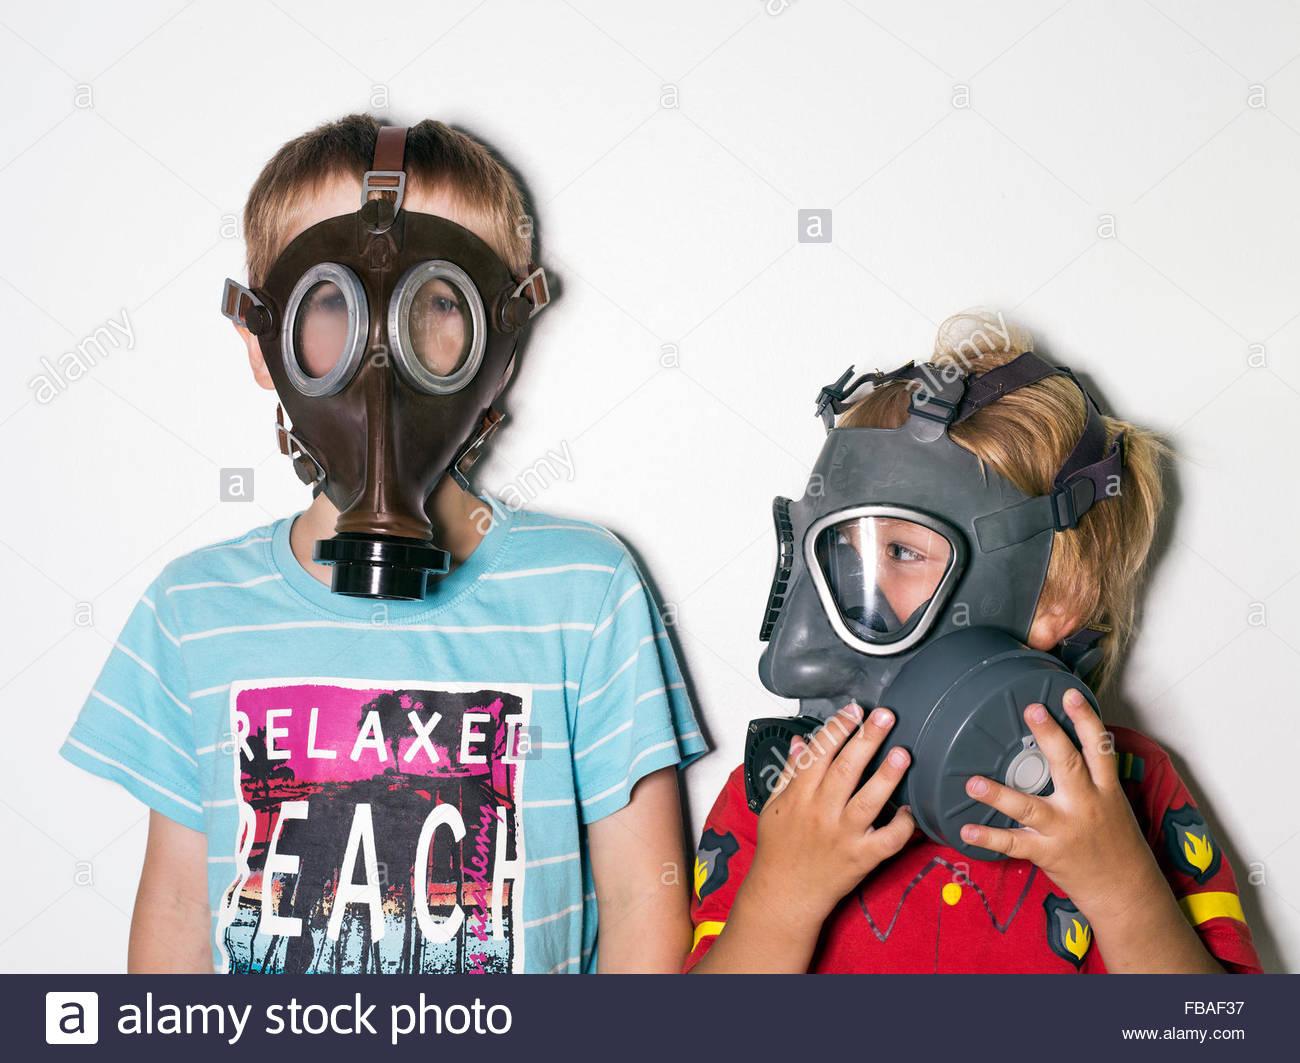 Boys (4-5, 6-7) wearing gas masks - Stock Image